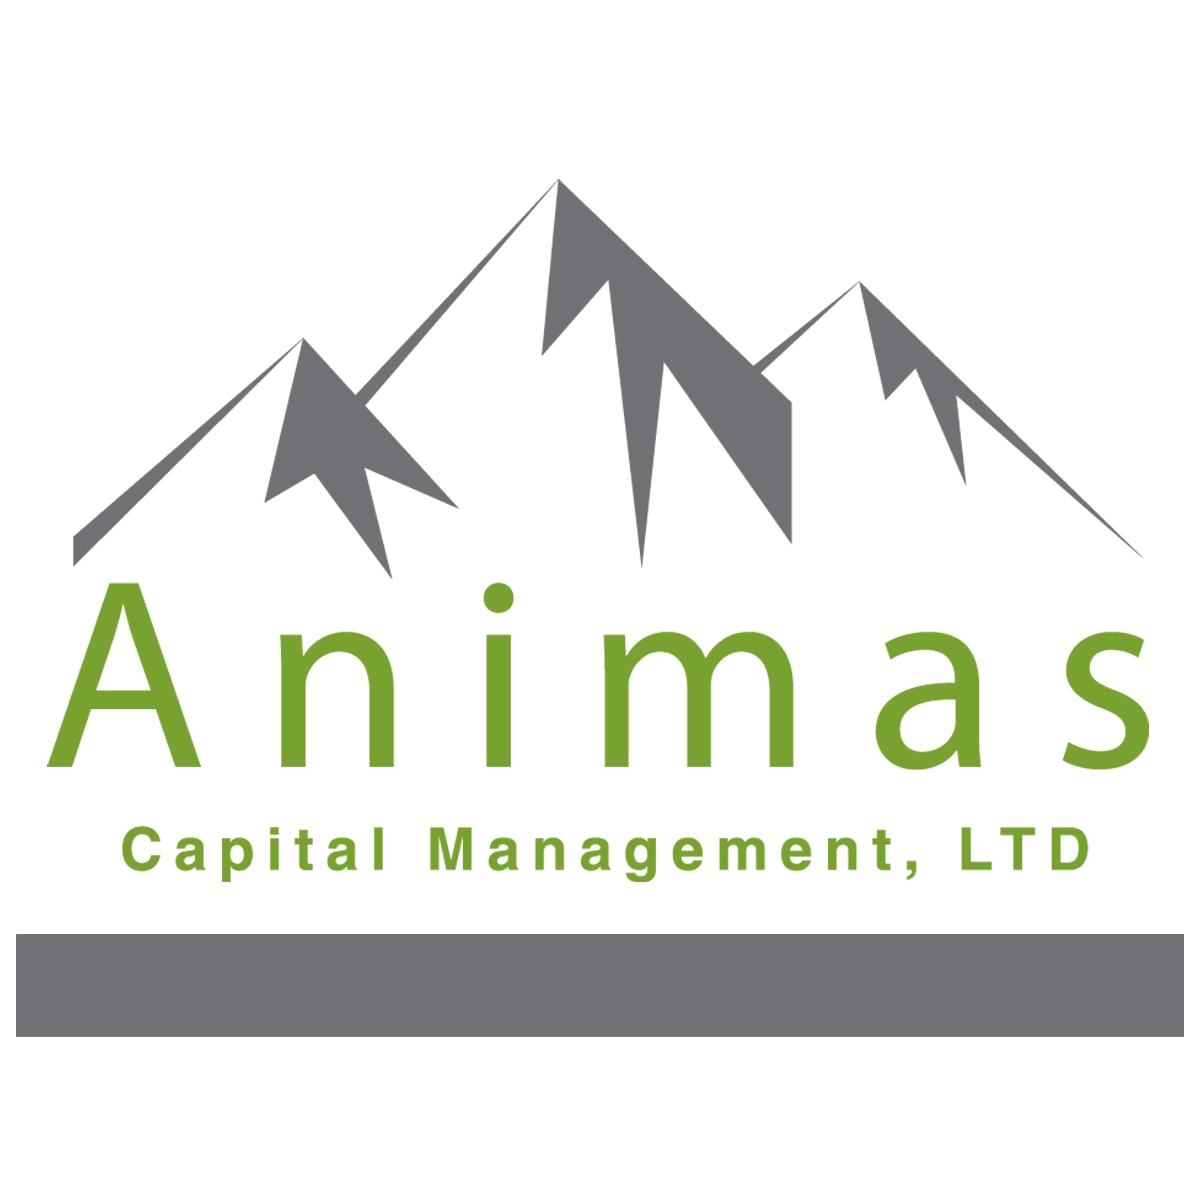 Animas Capital Management, LTD